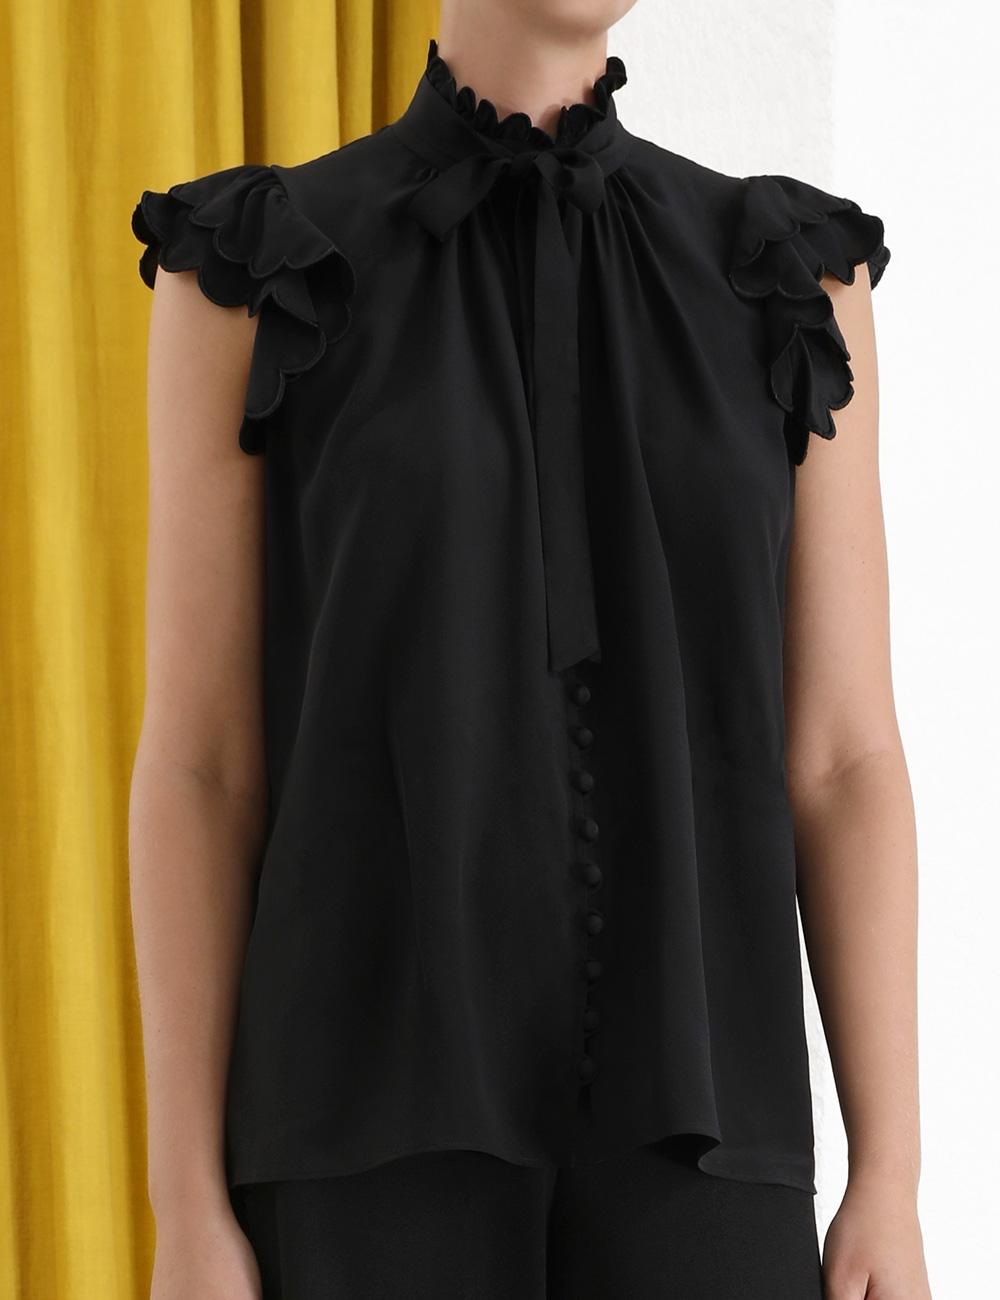 Silk Scallop Sleeveless Top